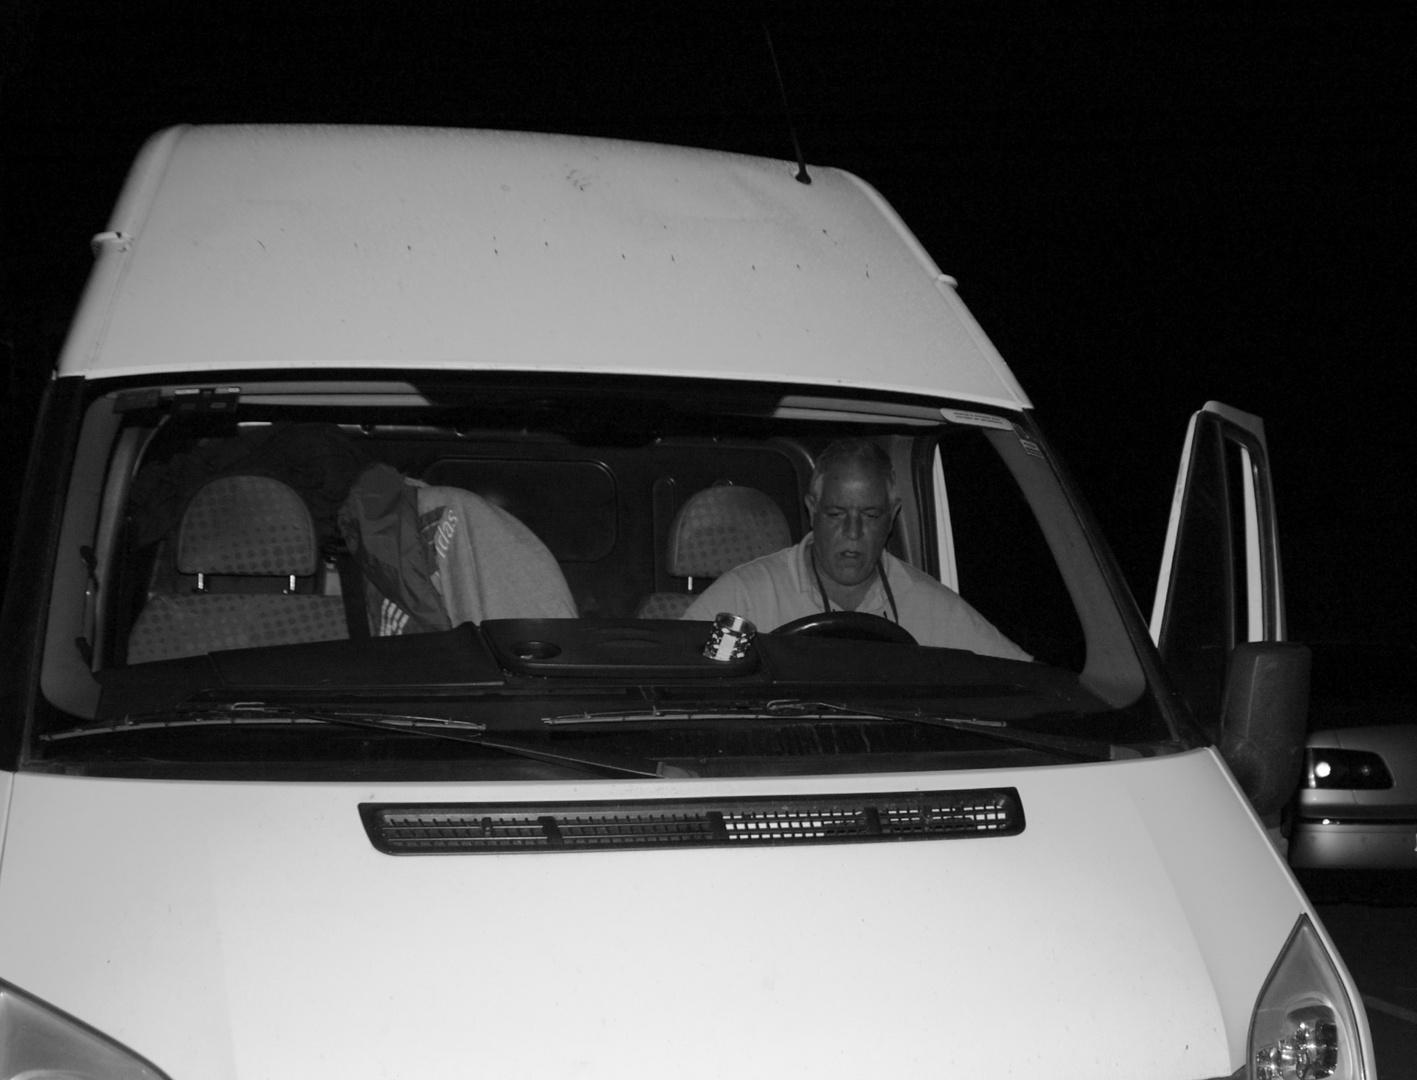 "Valldemossa, salida al aeropuerto 03:59 - 28mm F/4 1/50"" Iso 200"